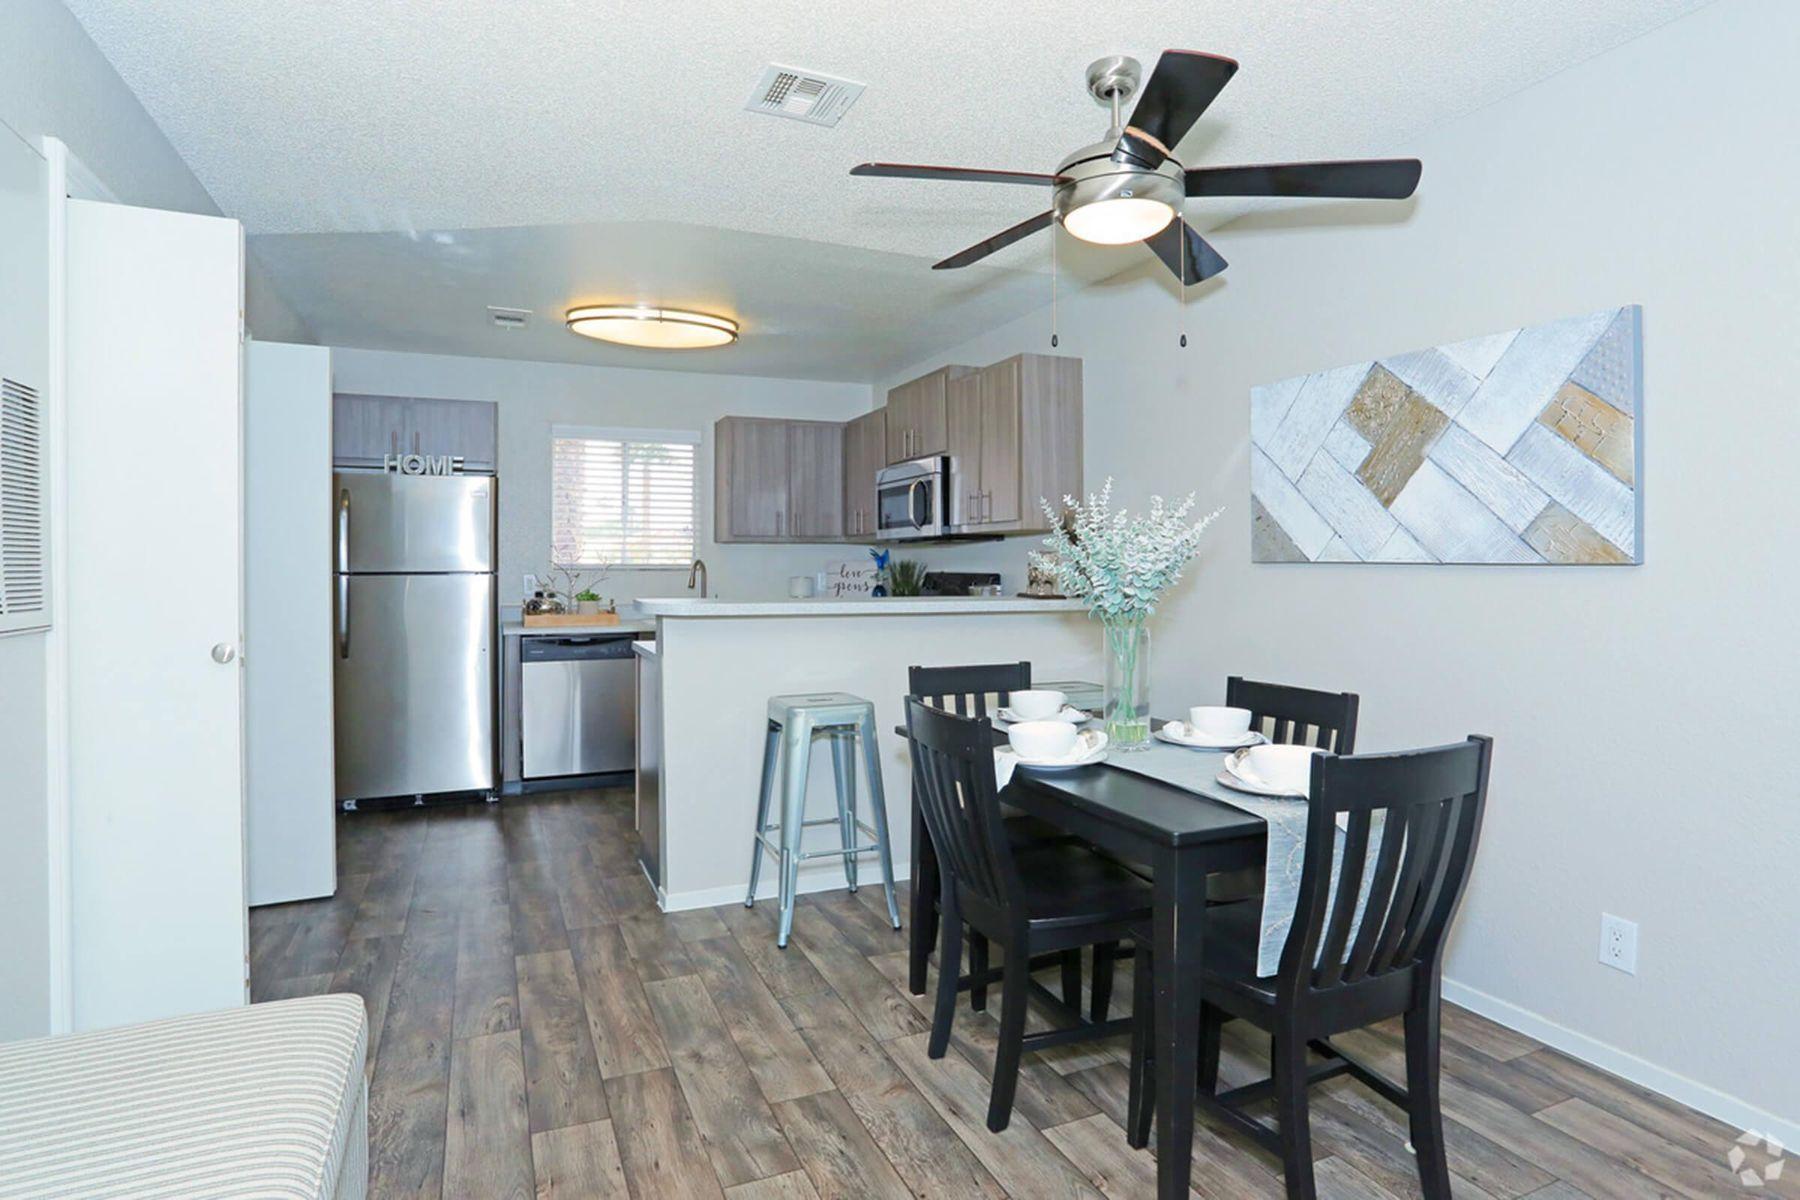 sunset-hills-apartments-henderson-nv-2br-2ba---960-sf-dining-room (1).jpg